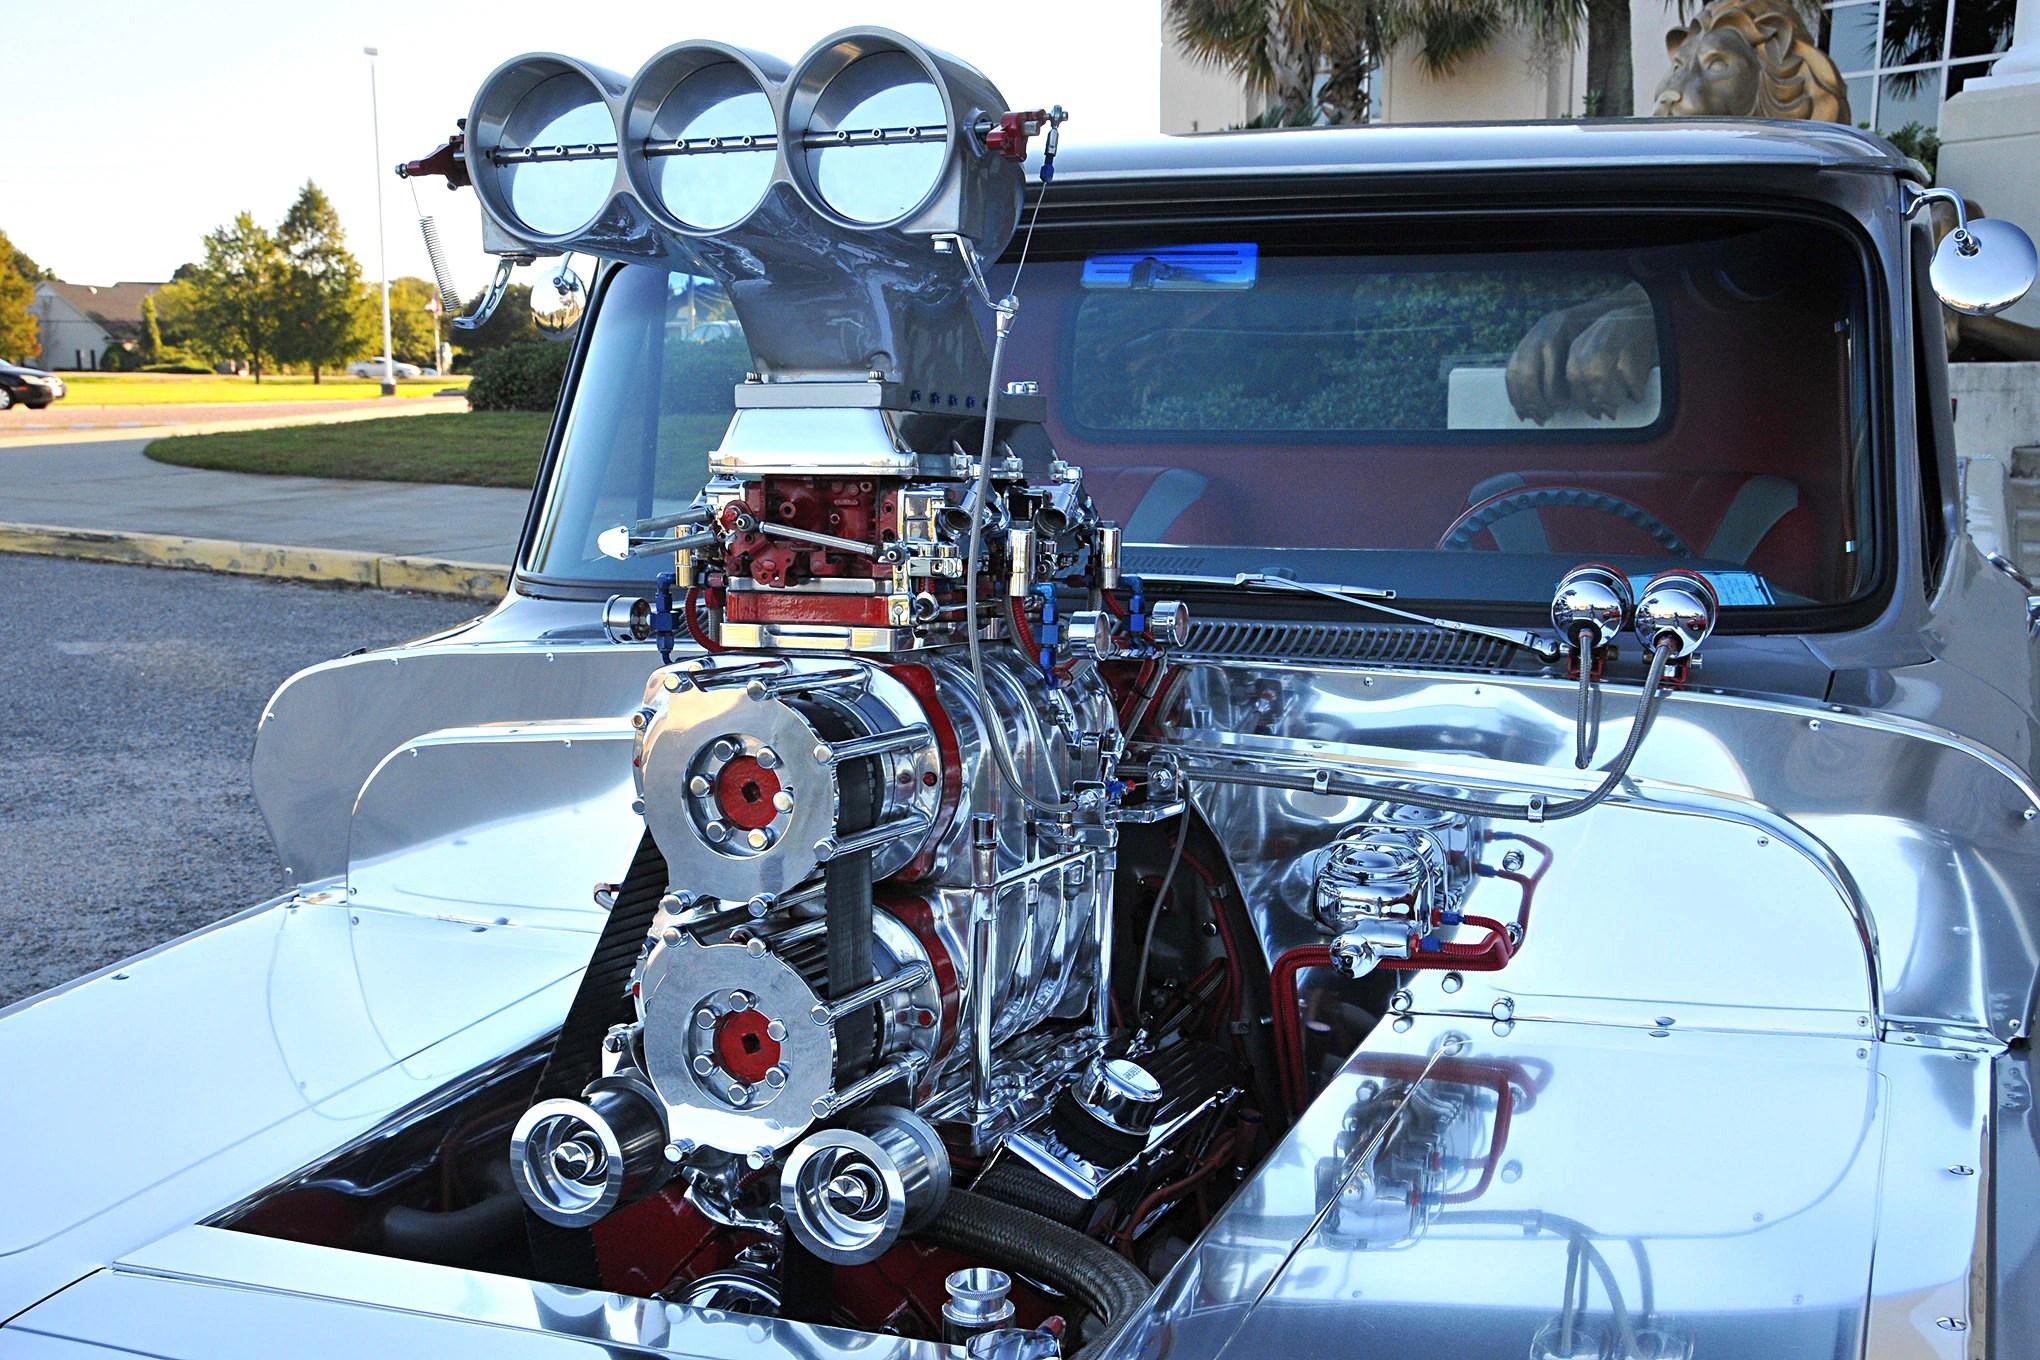 020-blower-mafia-supercharger-turbo-brad